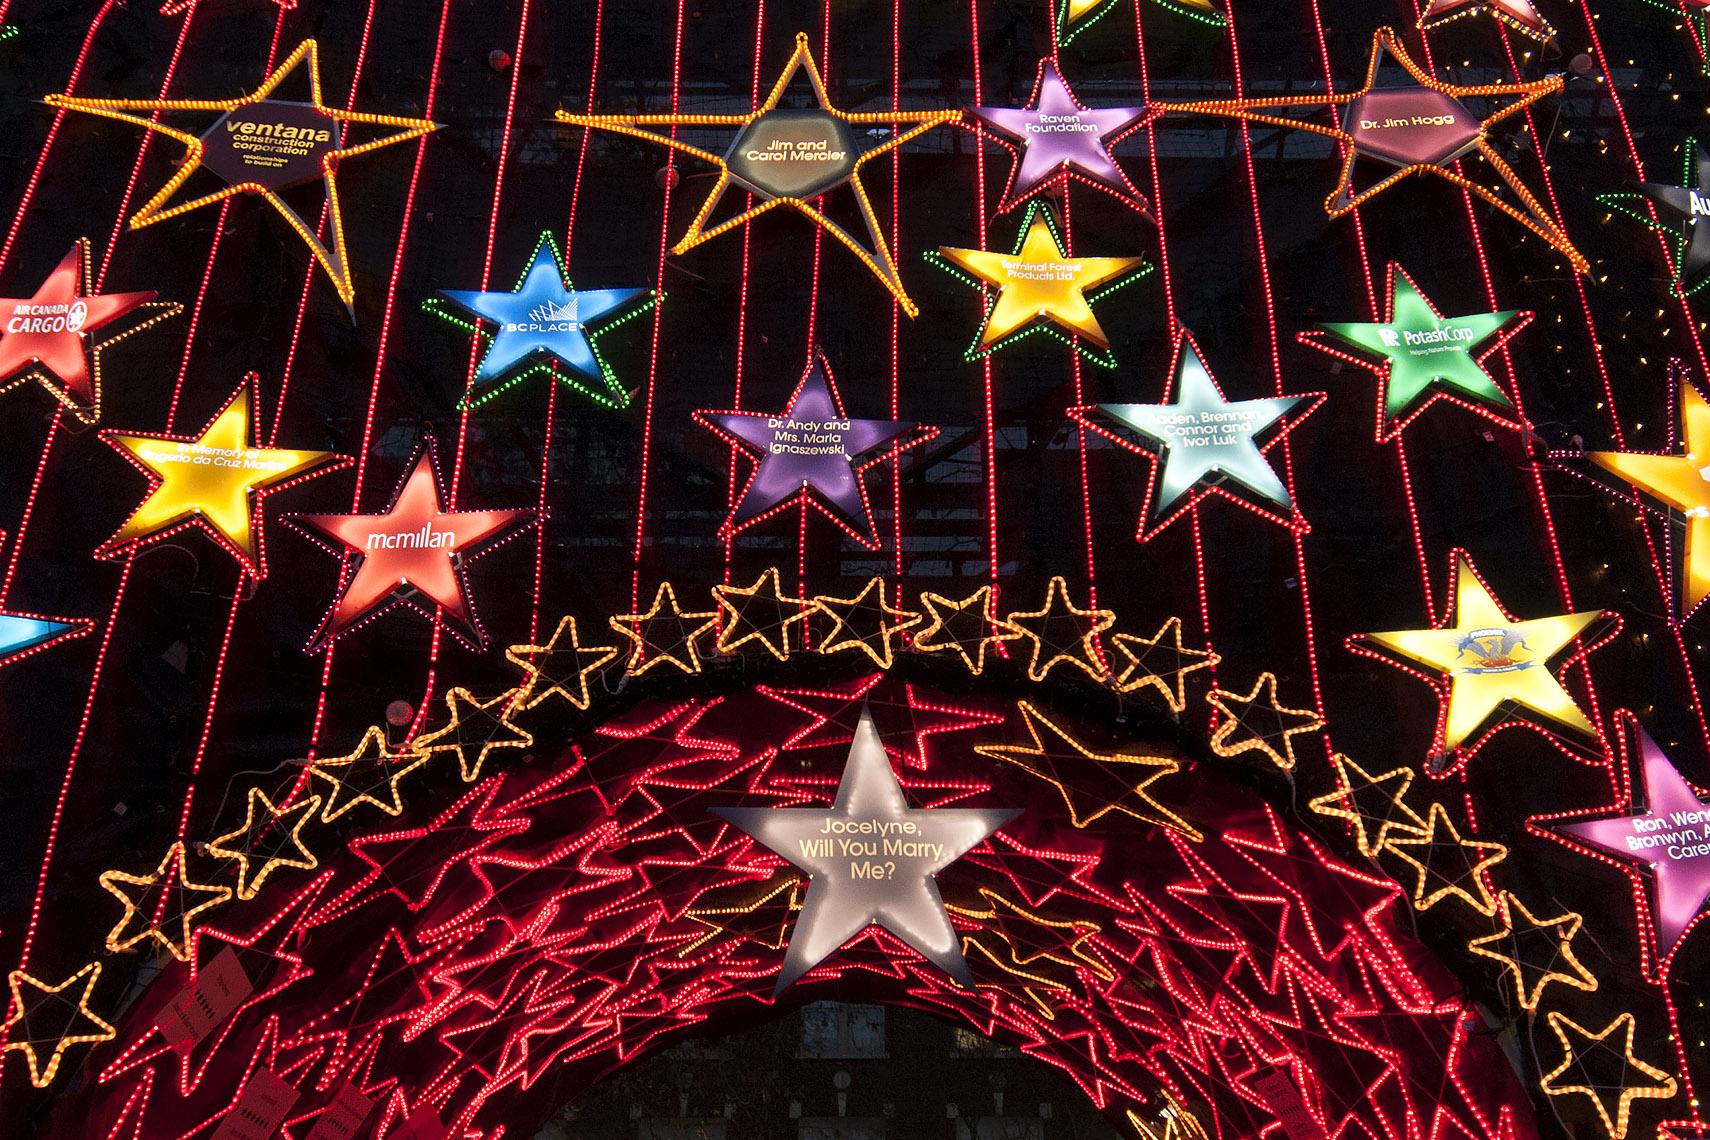 Image: St. Paul's Lights of Hope